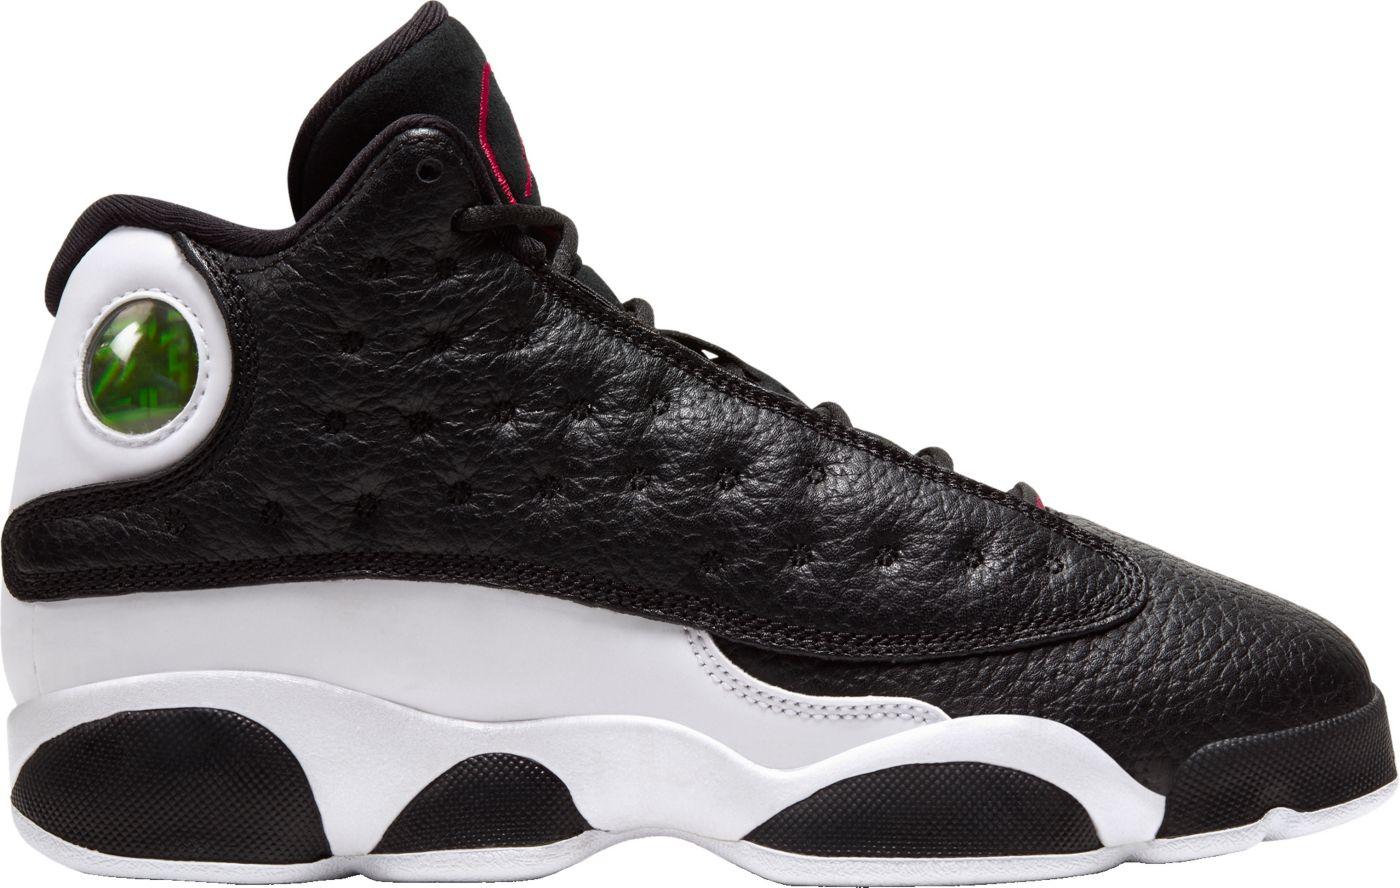 Jordan Kids' Grade School Air Jordan Retro 13 Basketball Shoes